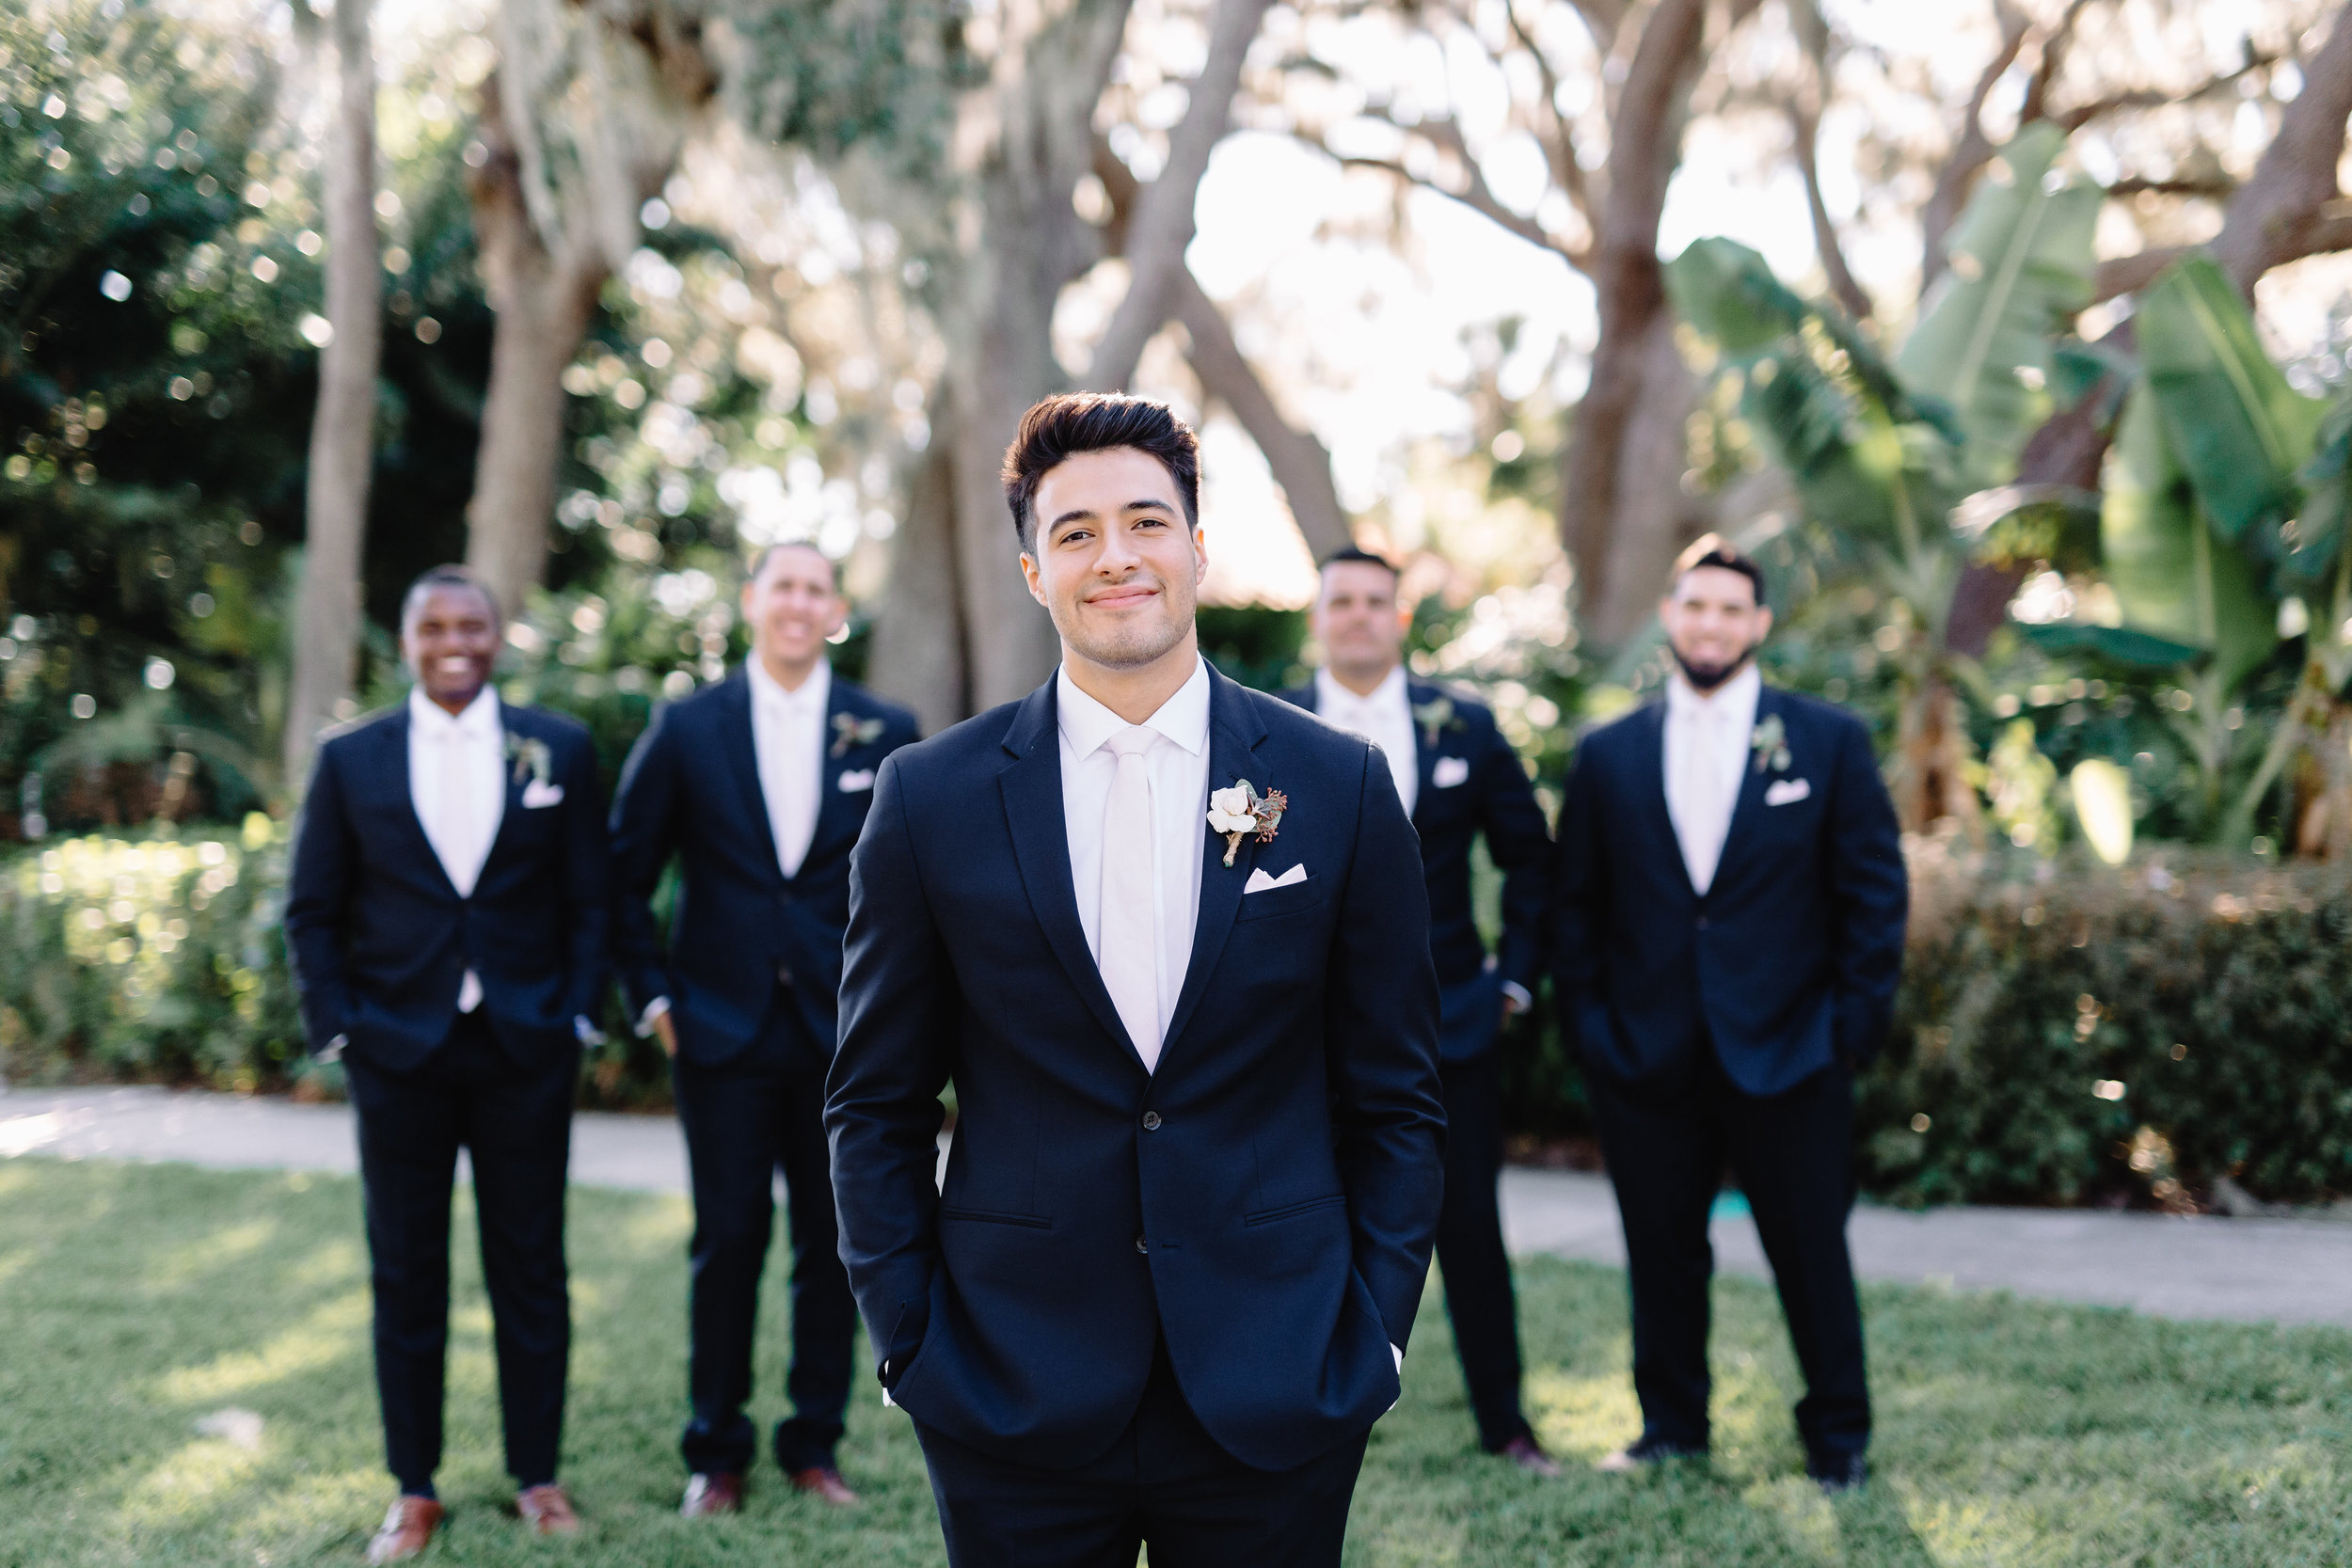 Orlando Wedding Planner Blue Ribbon Weddings  Orlando Wedding Photographer JP Pratt Photography  Wedding Ceremony & Reception at Tavares Pavilion on the Lake  Orlando Wedding Catering Puff n Stuff